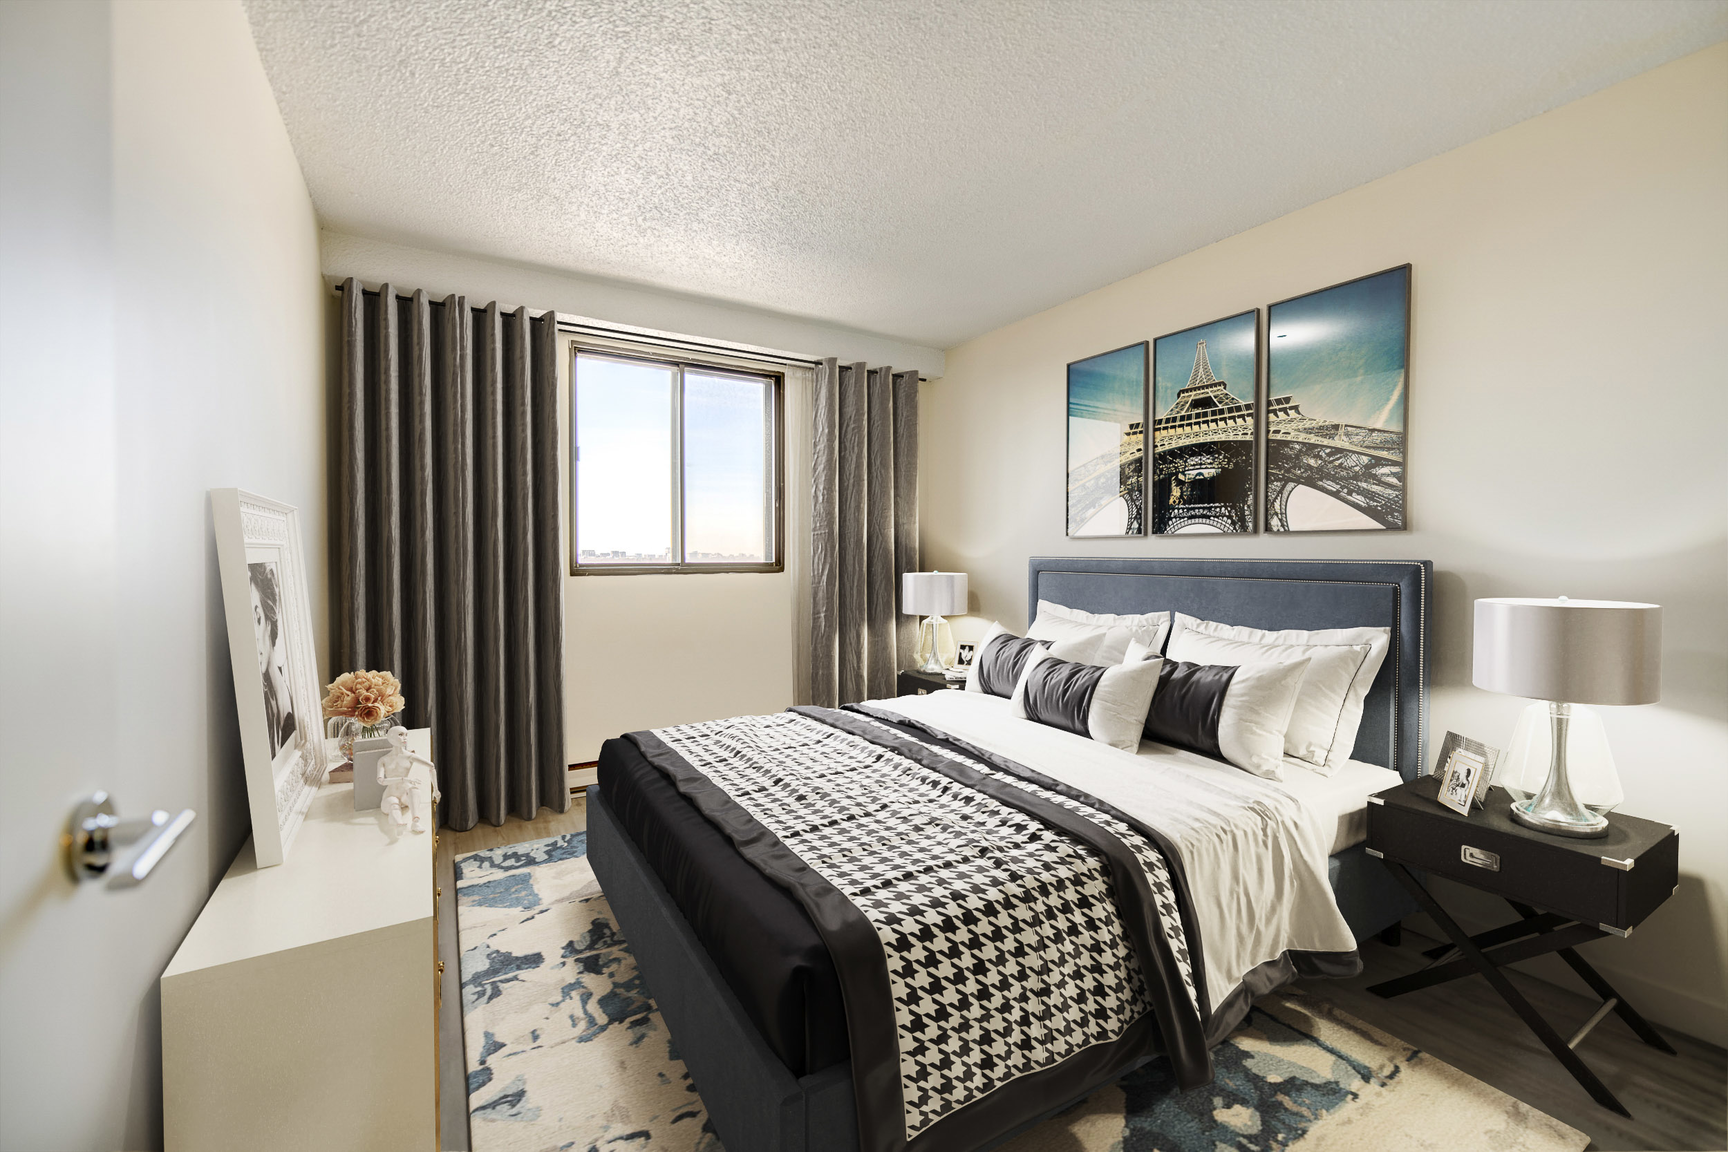 1 bedroom Apartments for rent in Laval at Le Quatre Cent - Photo 04 - RentQuebecApartments – L407184